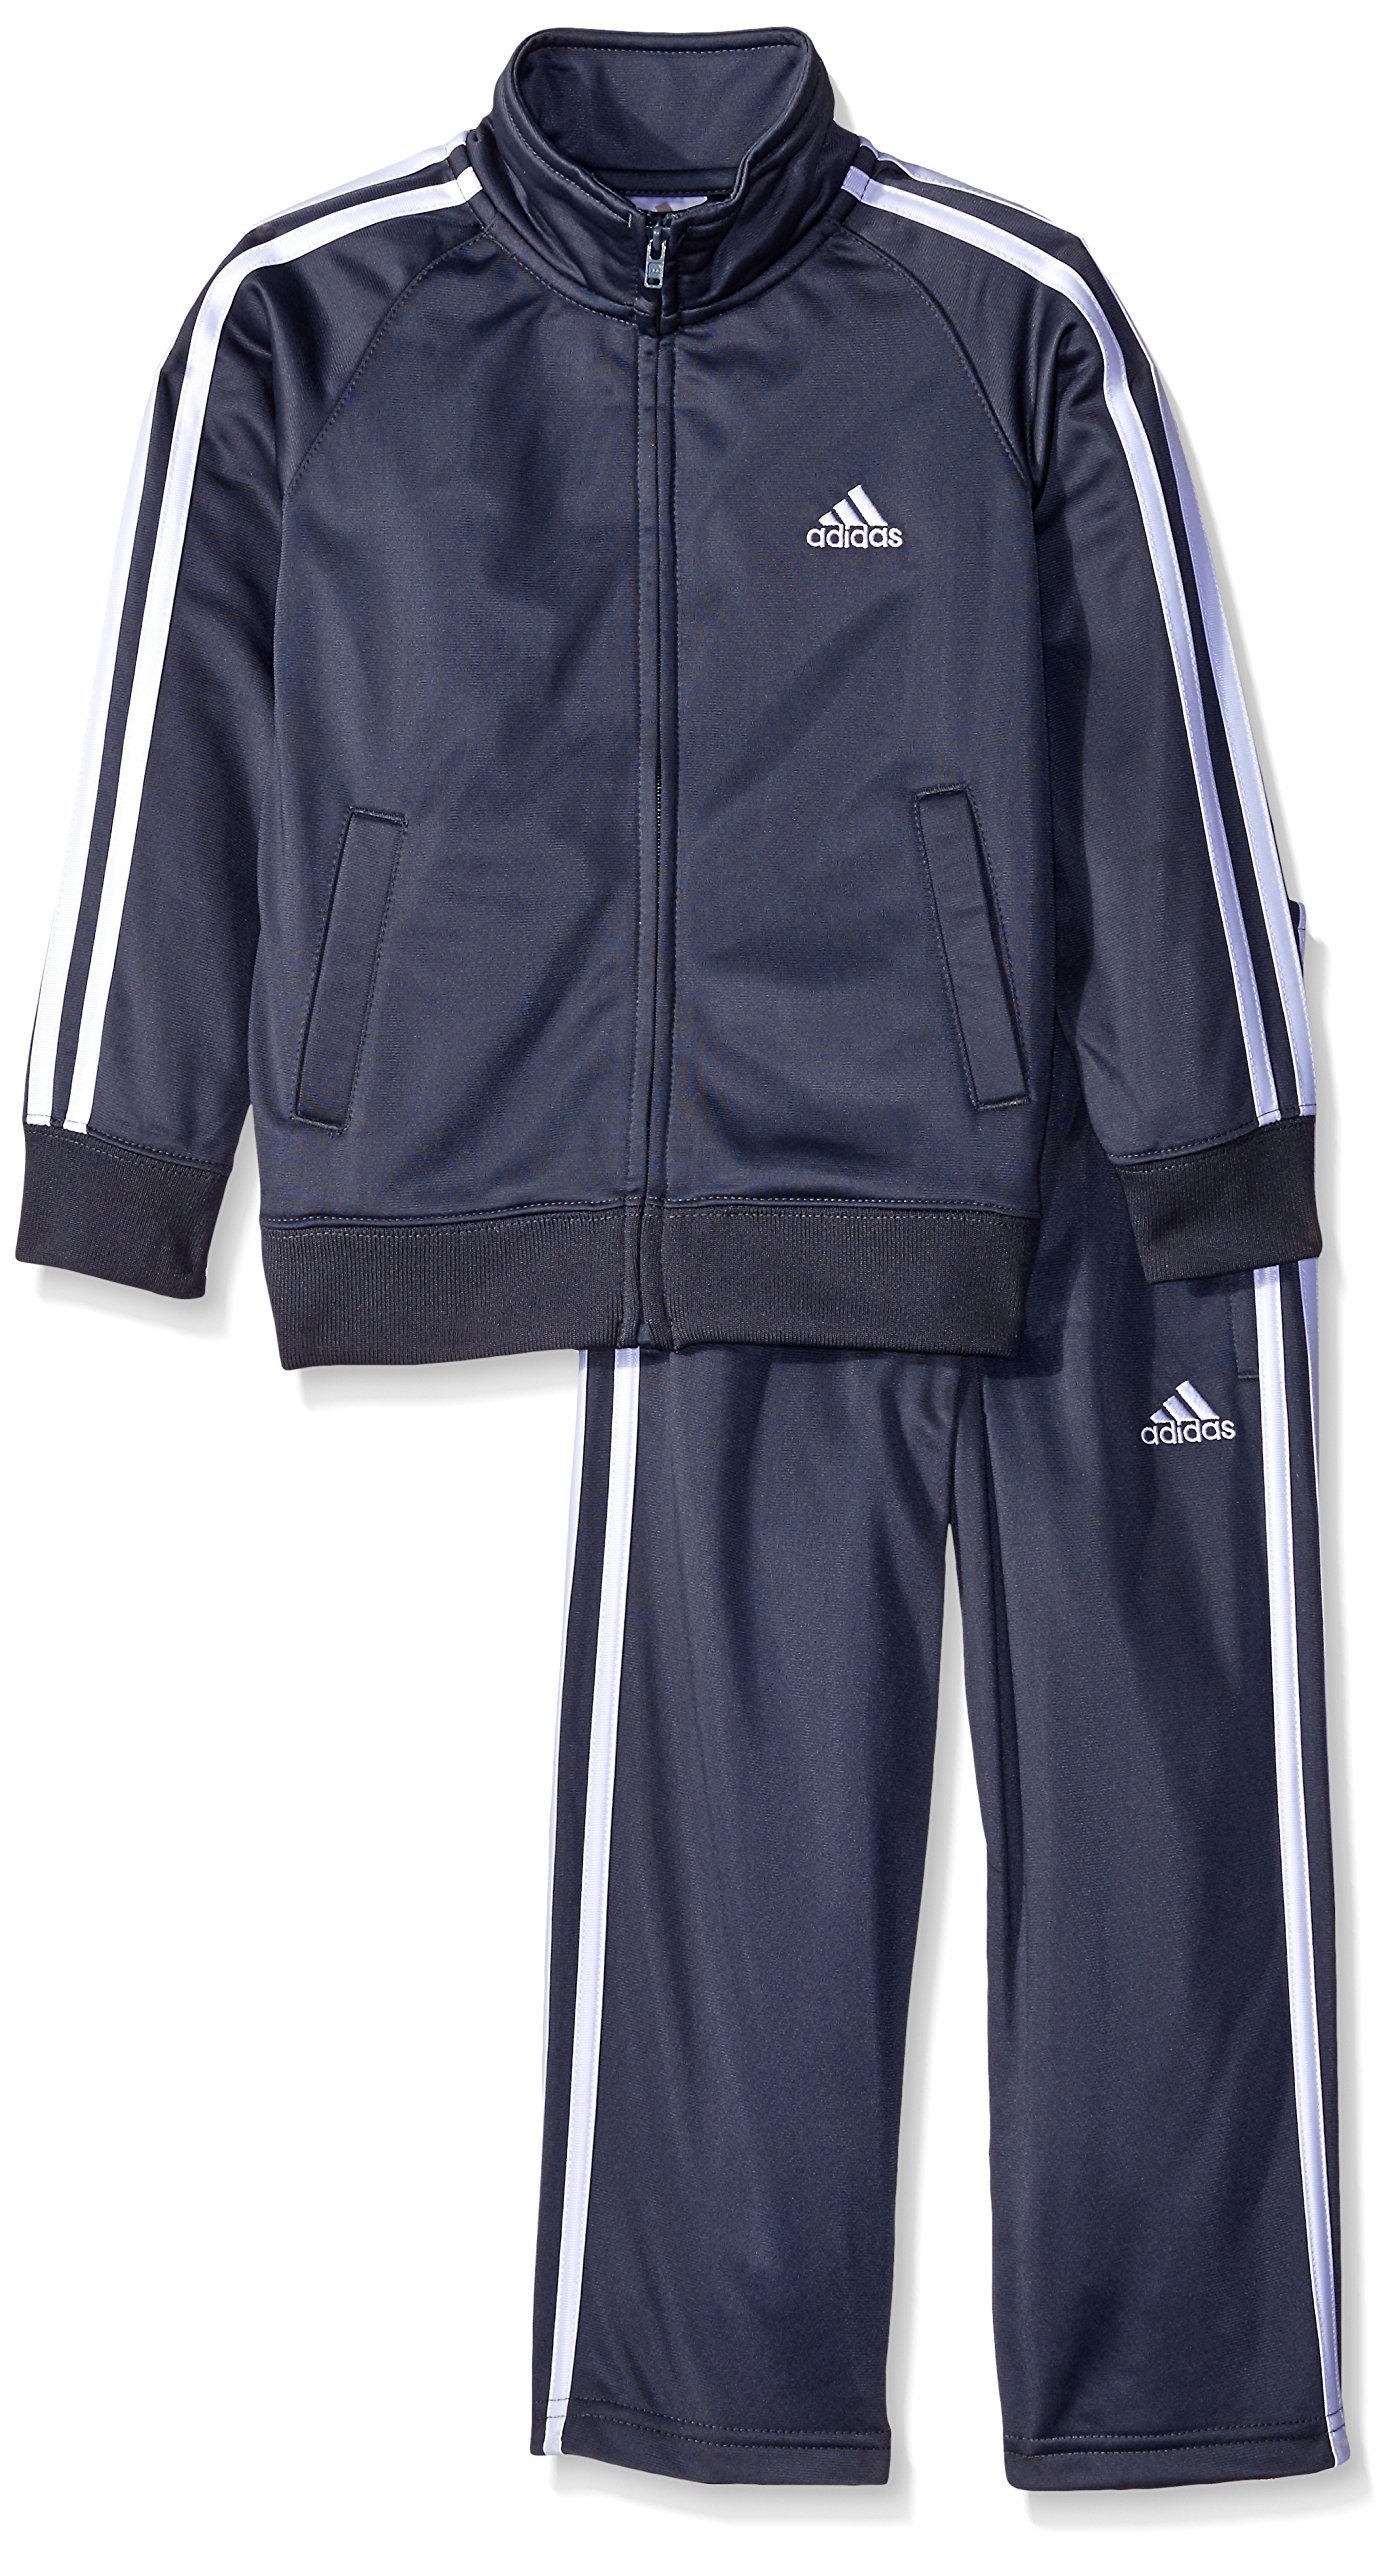 adidas Little Boys' Iconic Tricot Jacket and Pant Set, Grey, 6